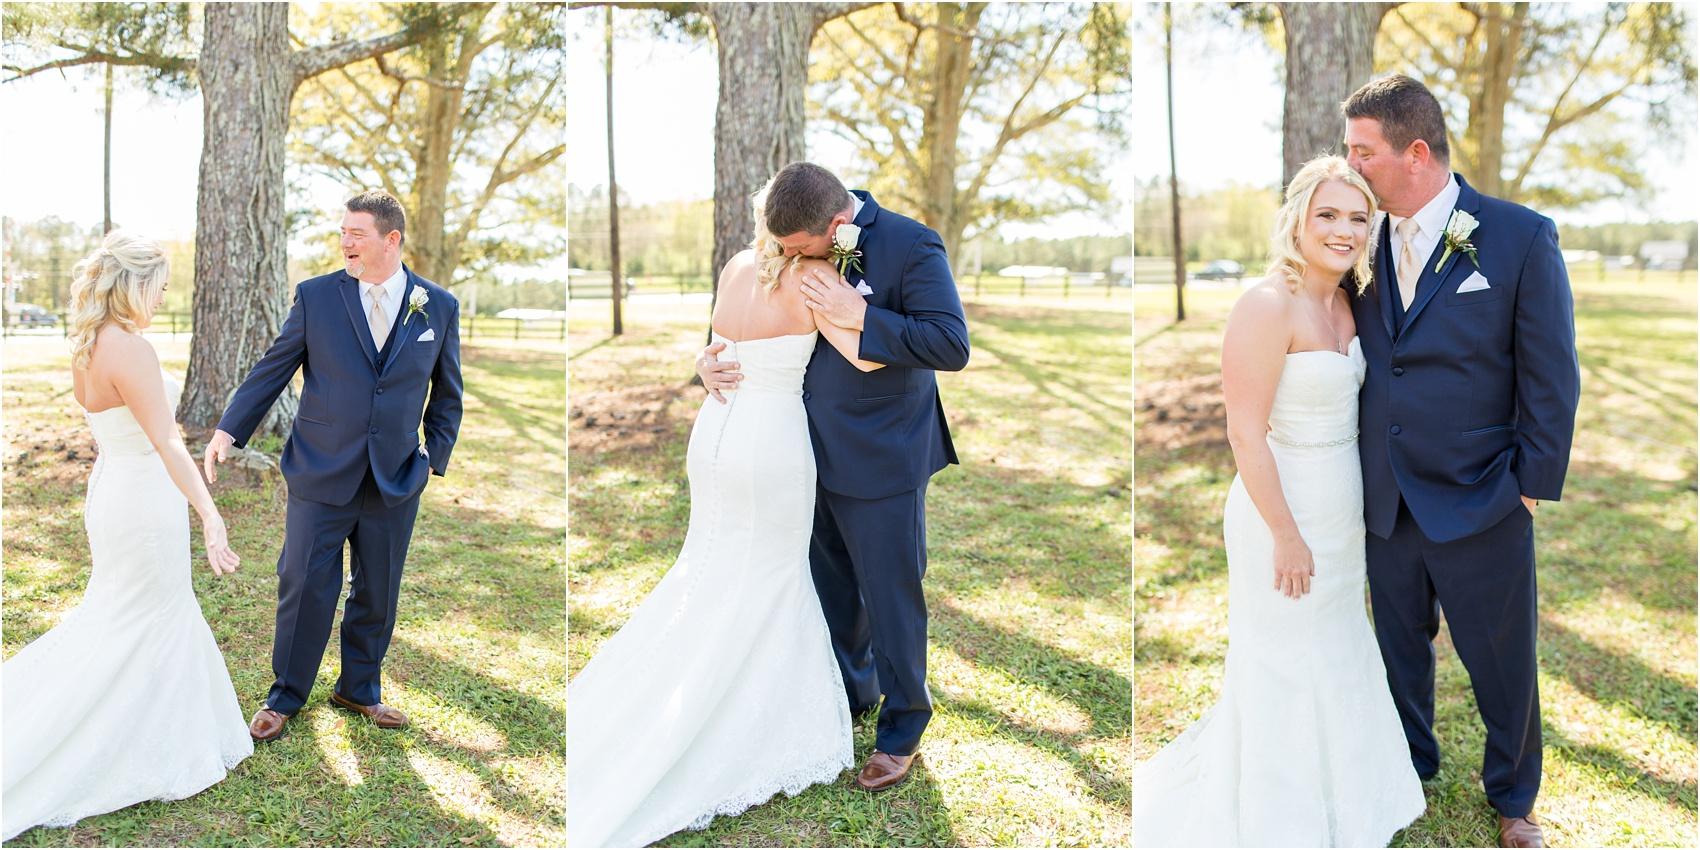 Savannah Eve Photography- Wade Wedding-11.jpg